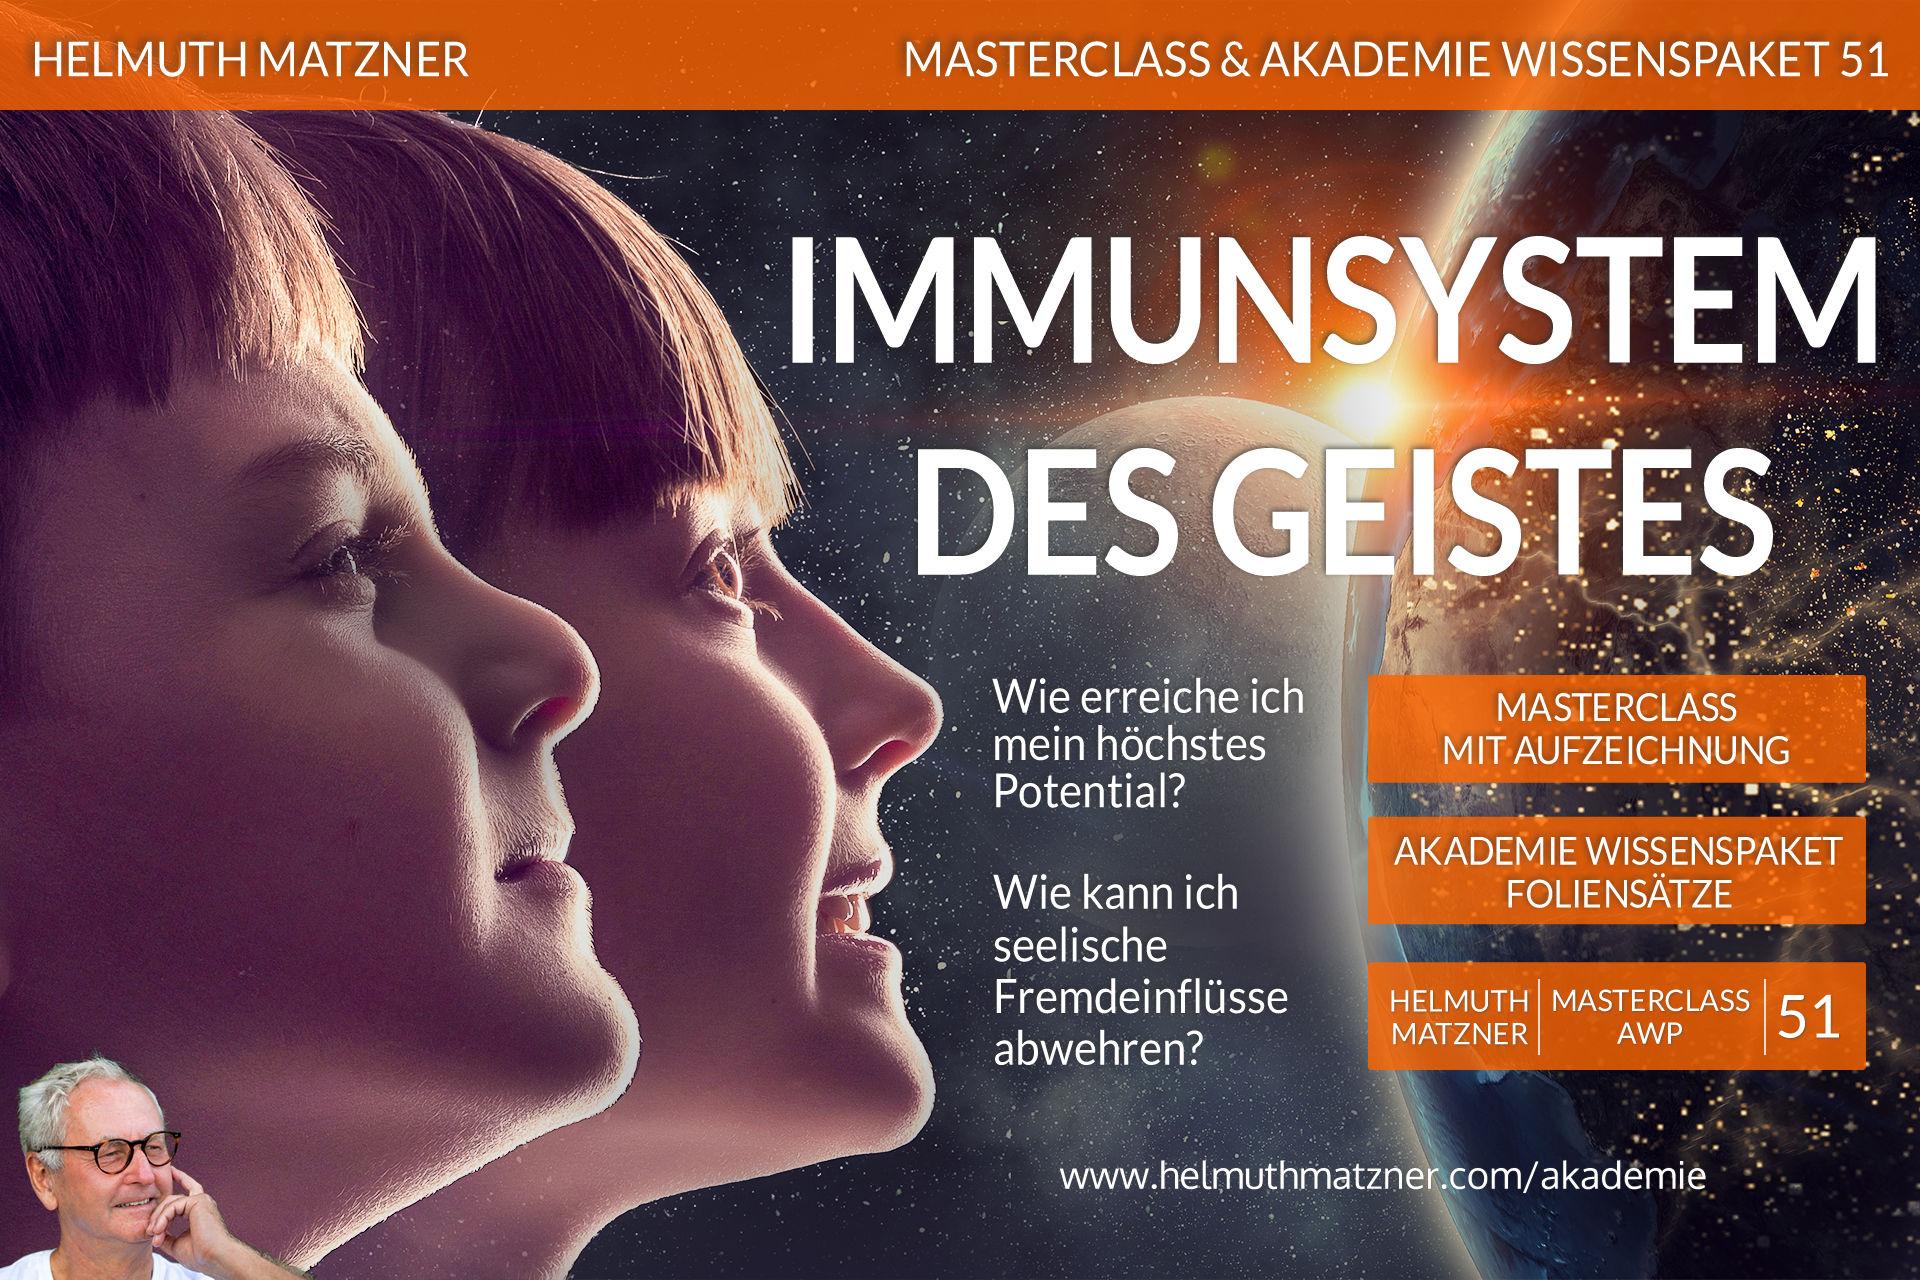 Helmuth Matzner - Masterclass & Akademie Wissenspaket 51 - Immunsystem des Geistes - AKADEMIE - v05B